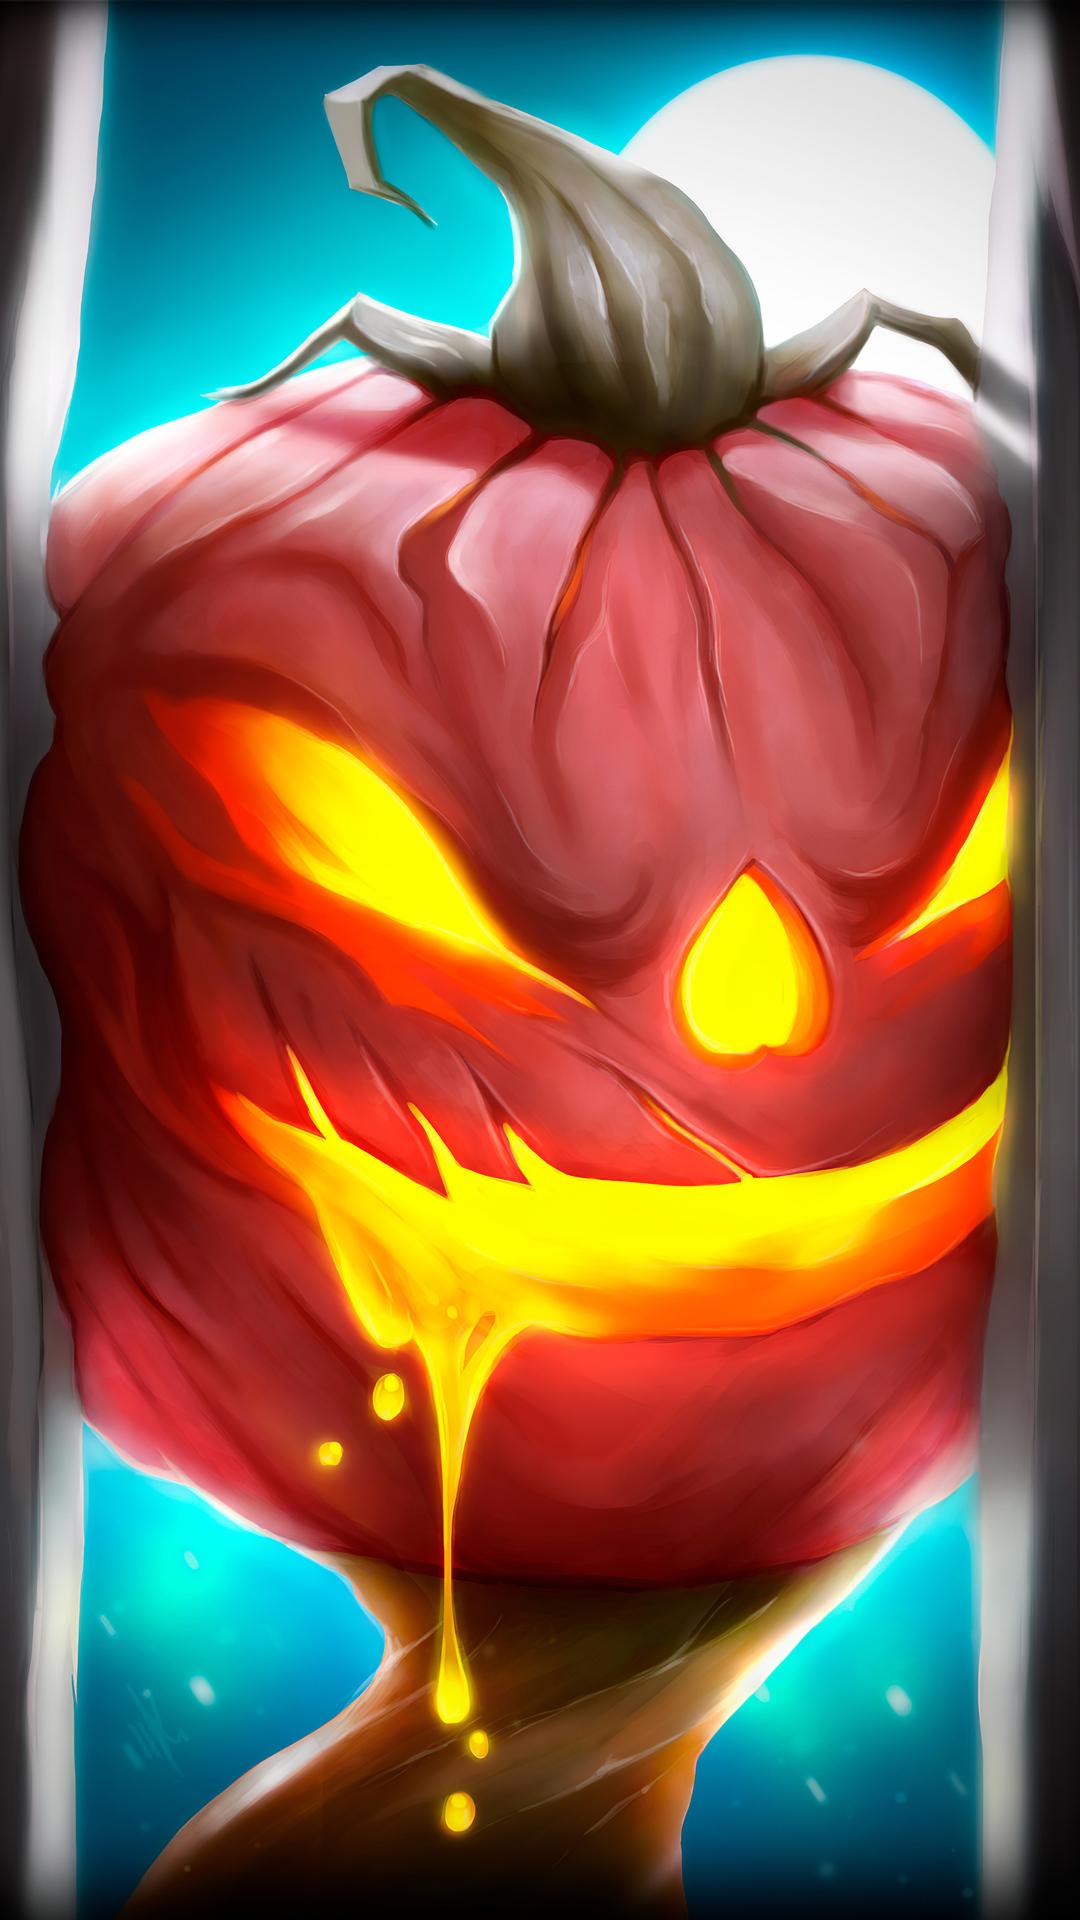 1080x1920 Happy Halloween My Friend Iphone 7 6s 6 Plus Pixel Xl